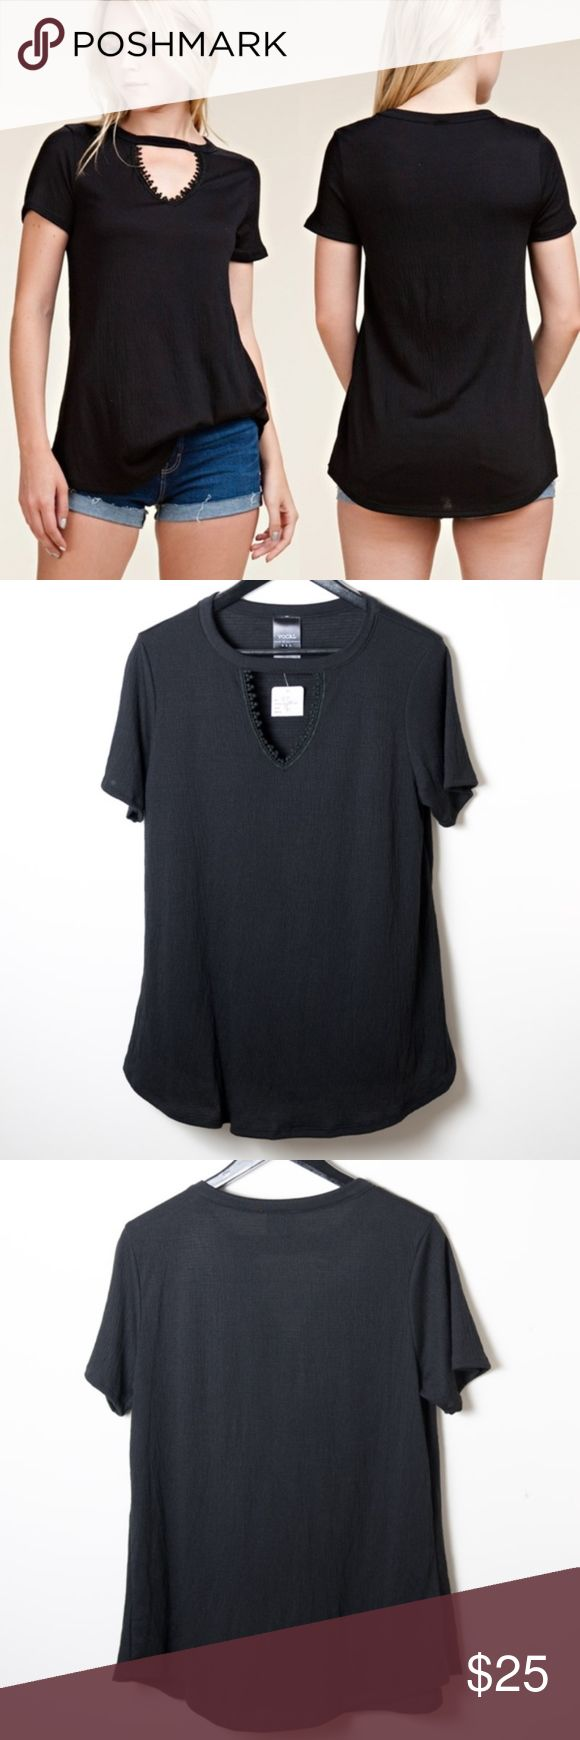 NWT Vocal Black Short Sleeve Top Medium Keyhole New with tags black Vocal short sleeve top. Keyhole neck with feminine embellishments.  Size medium. Vocal Tops Blouses